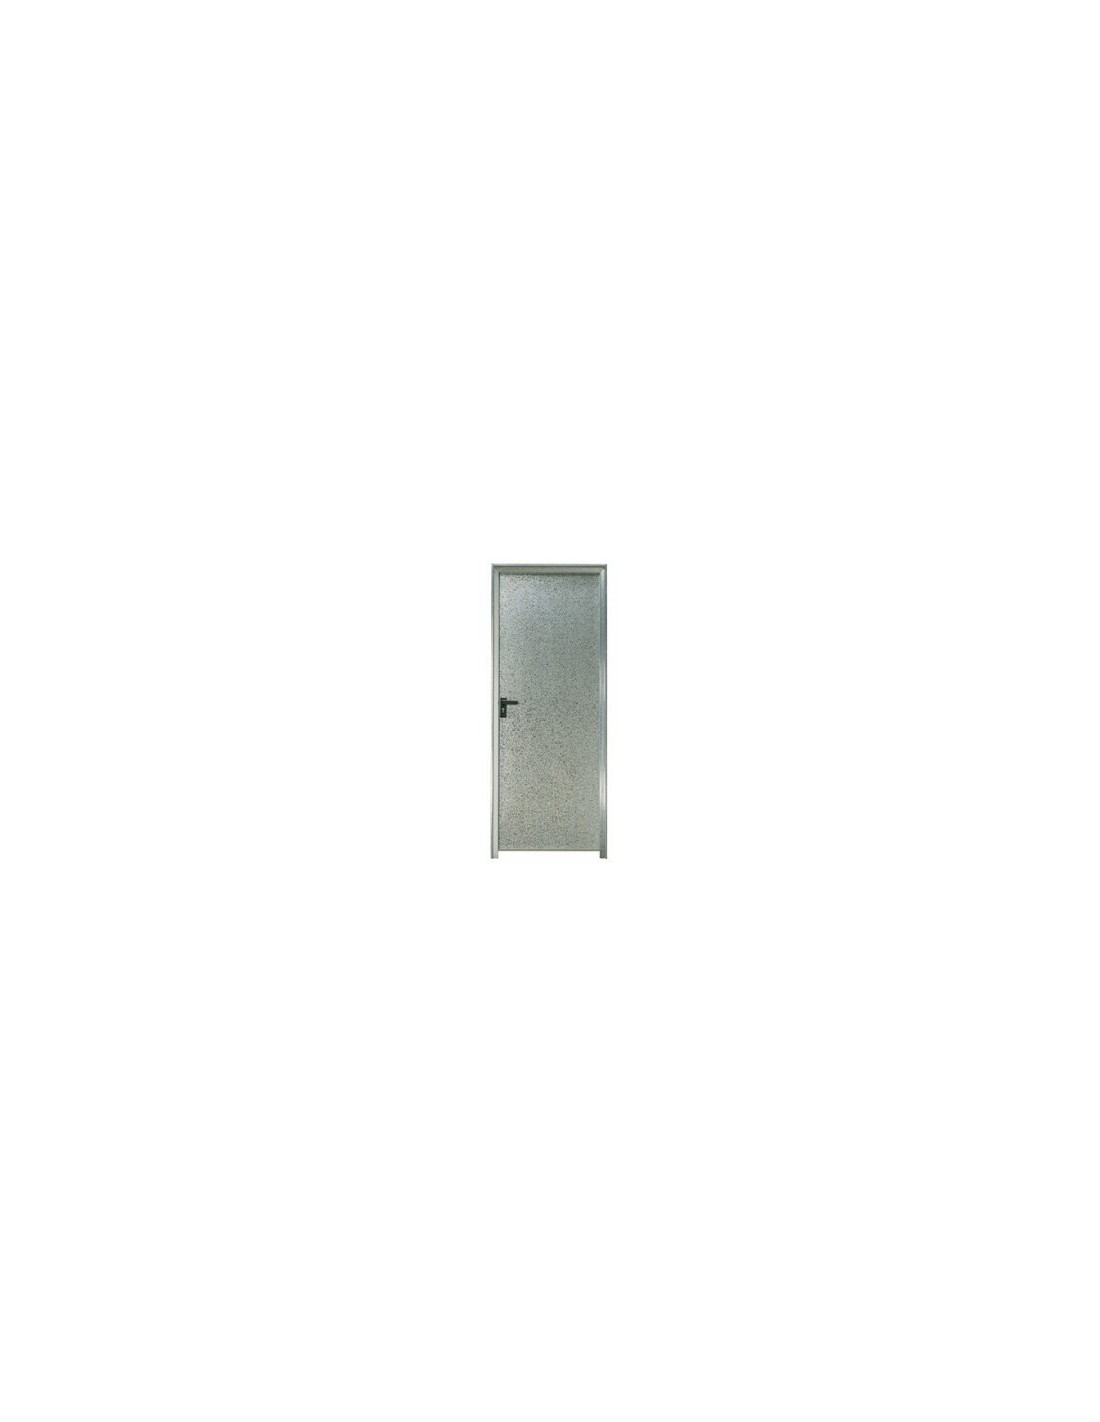 Puerta chapa galvanizada 100 x 2 m ciega marco de 90 mm for Puerta galvanizada